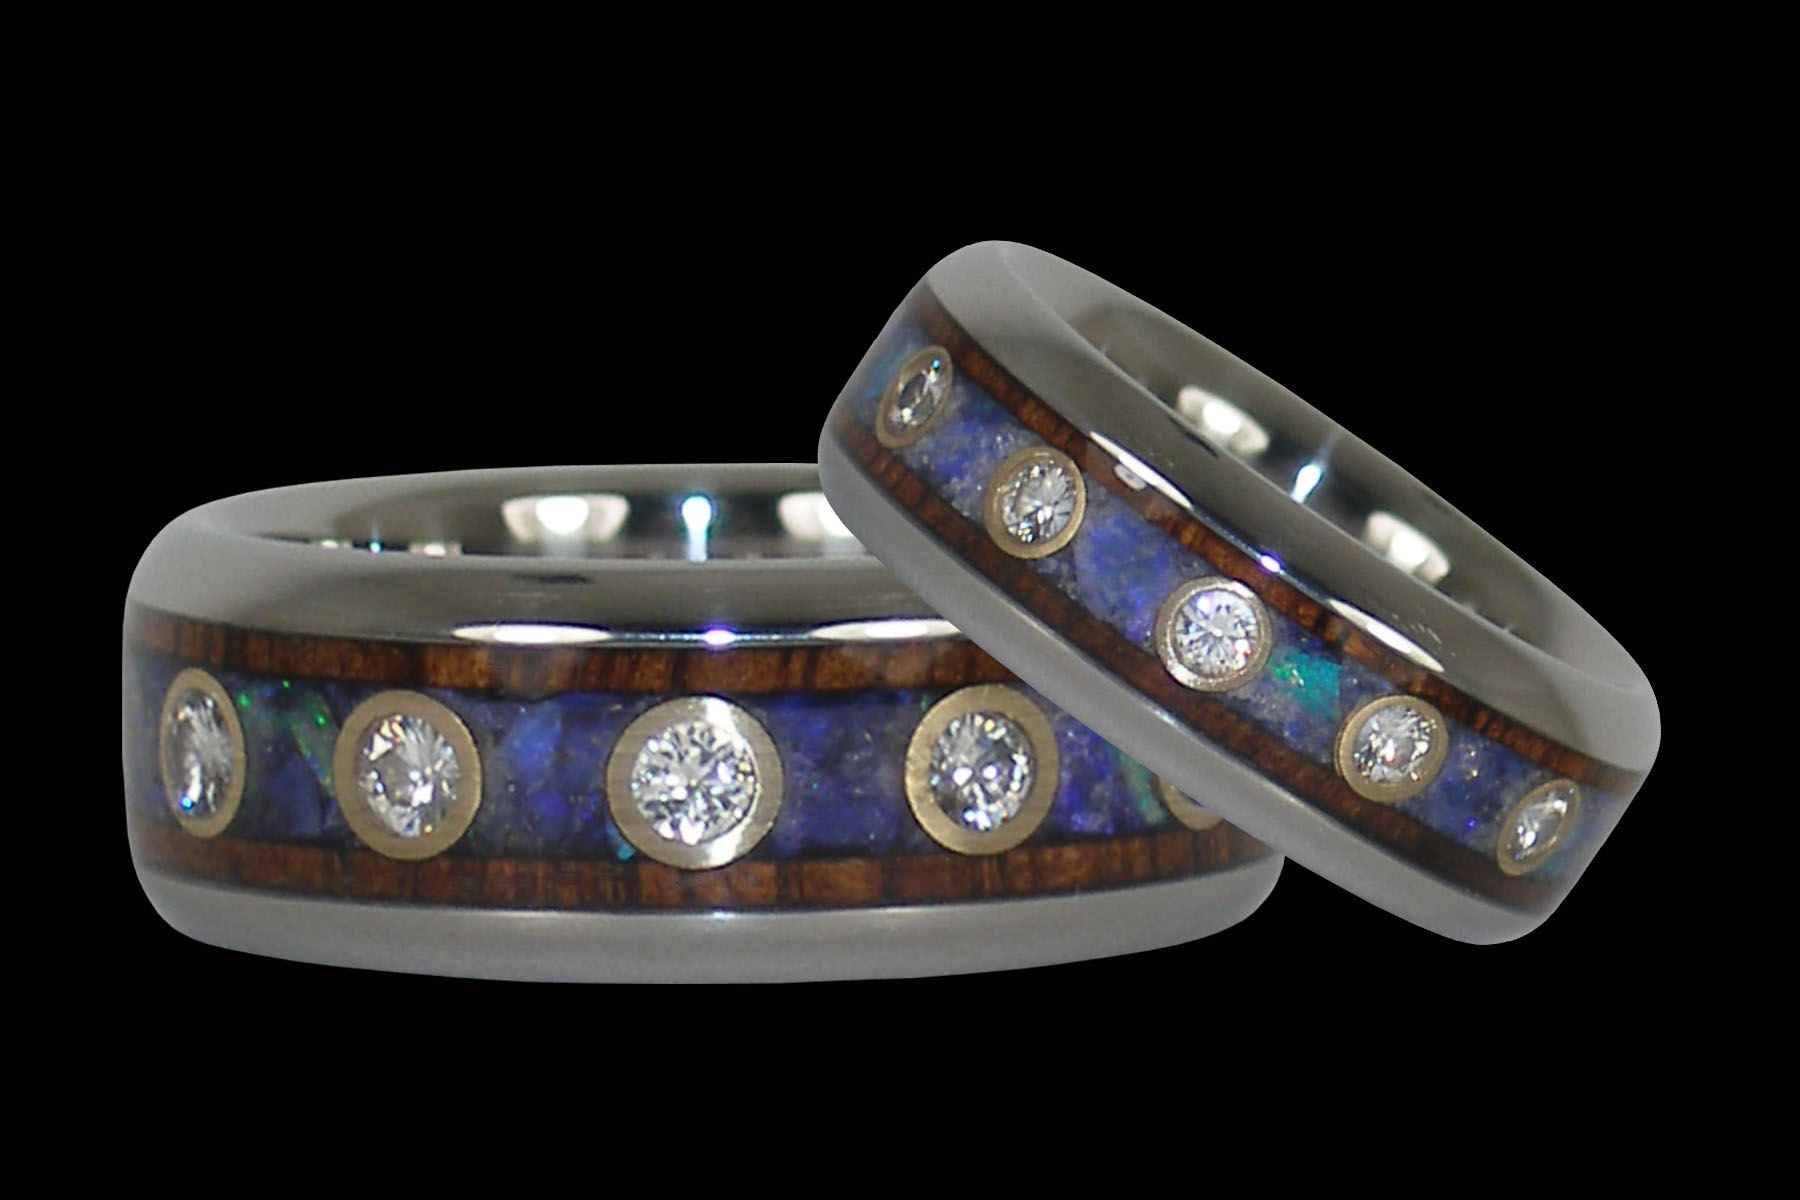 Australian Opal and Koa Titanium Rings with Twelve